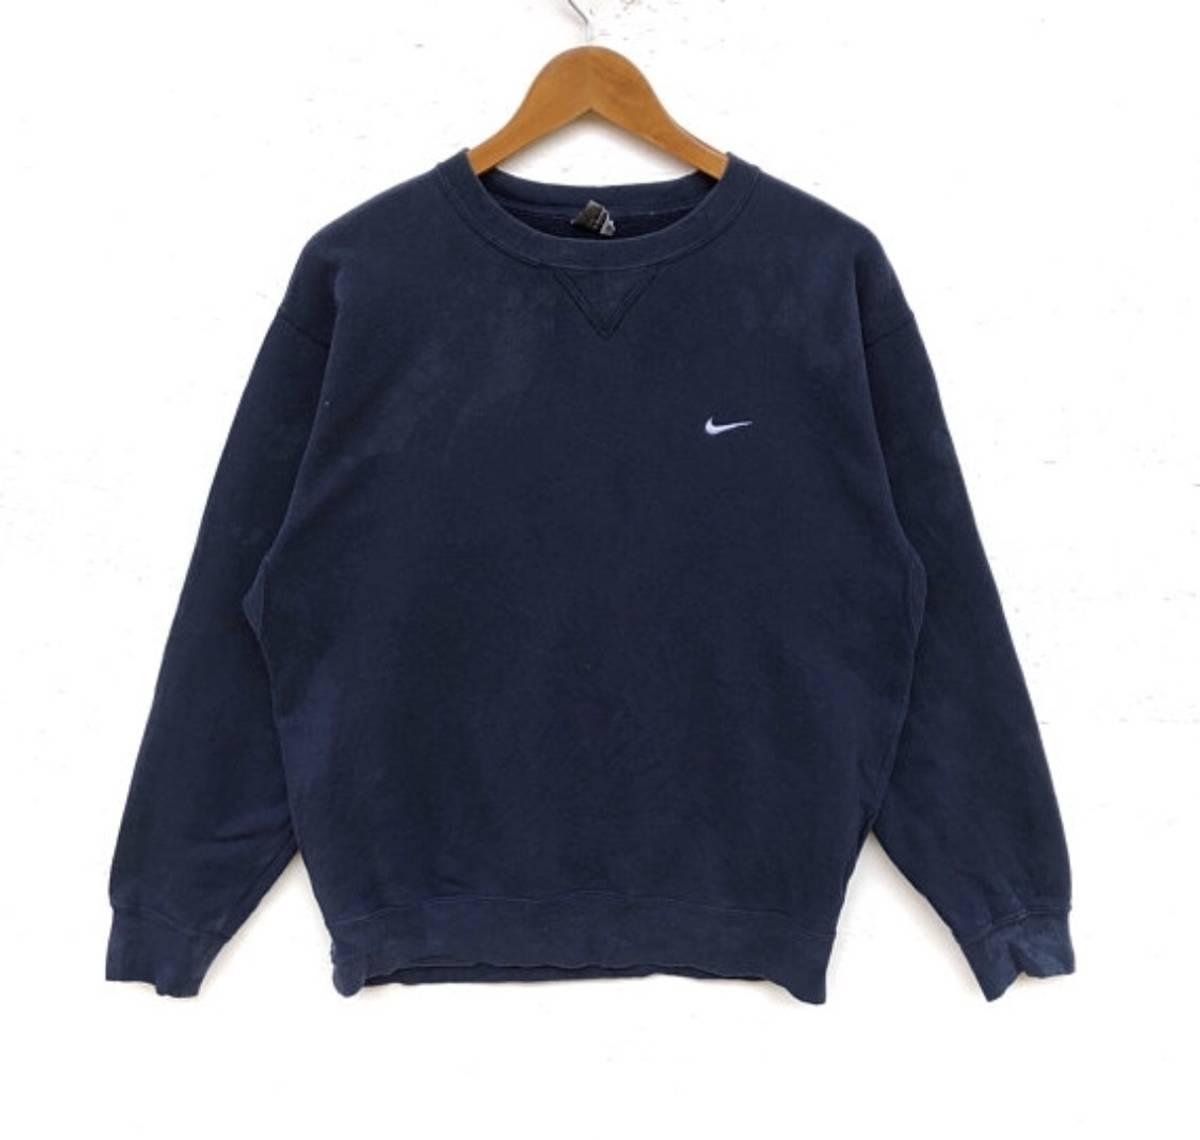 purchase cheap e4e5a a1ed2 Nike Final Drop‼️nike Swoosh Sweatshirt Small Logo Embroidery Sweat Medium  Size Jumper Pullover Jacket Sweater Shirt Vintage 90's Size M $28